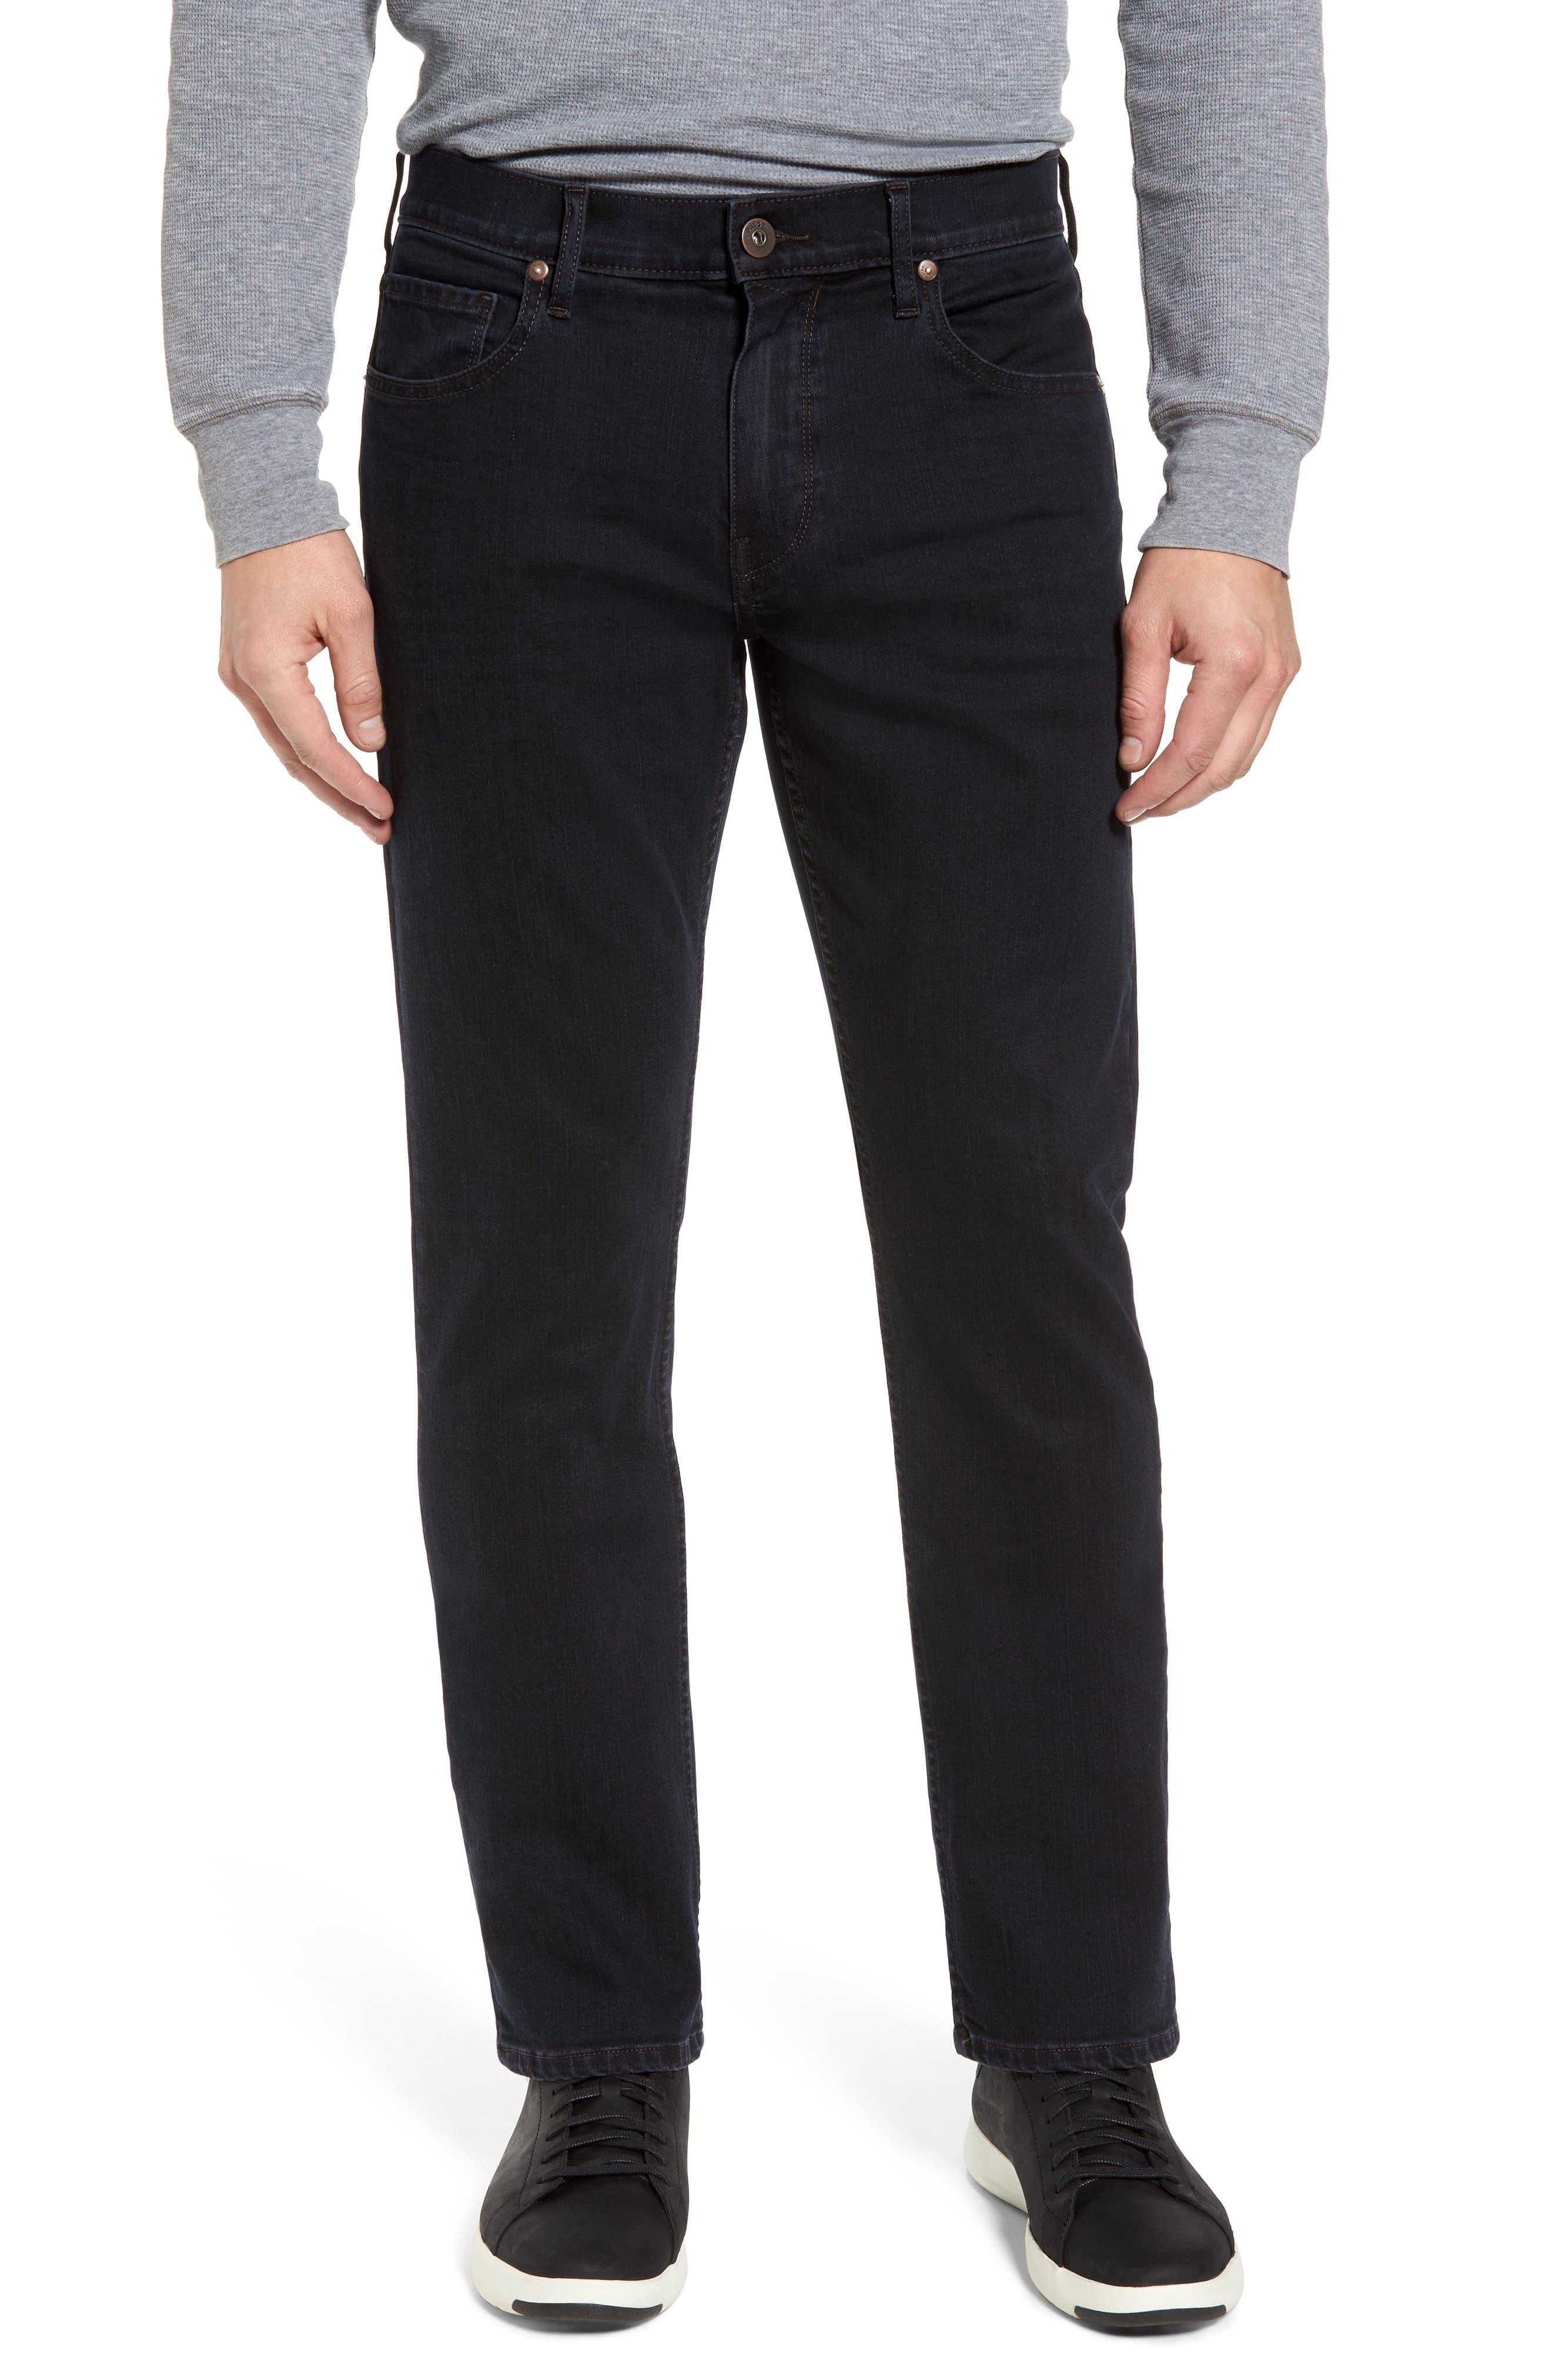 Normandie Straight Leg Jeans,                             Main thumbnail 1, color,